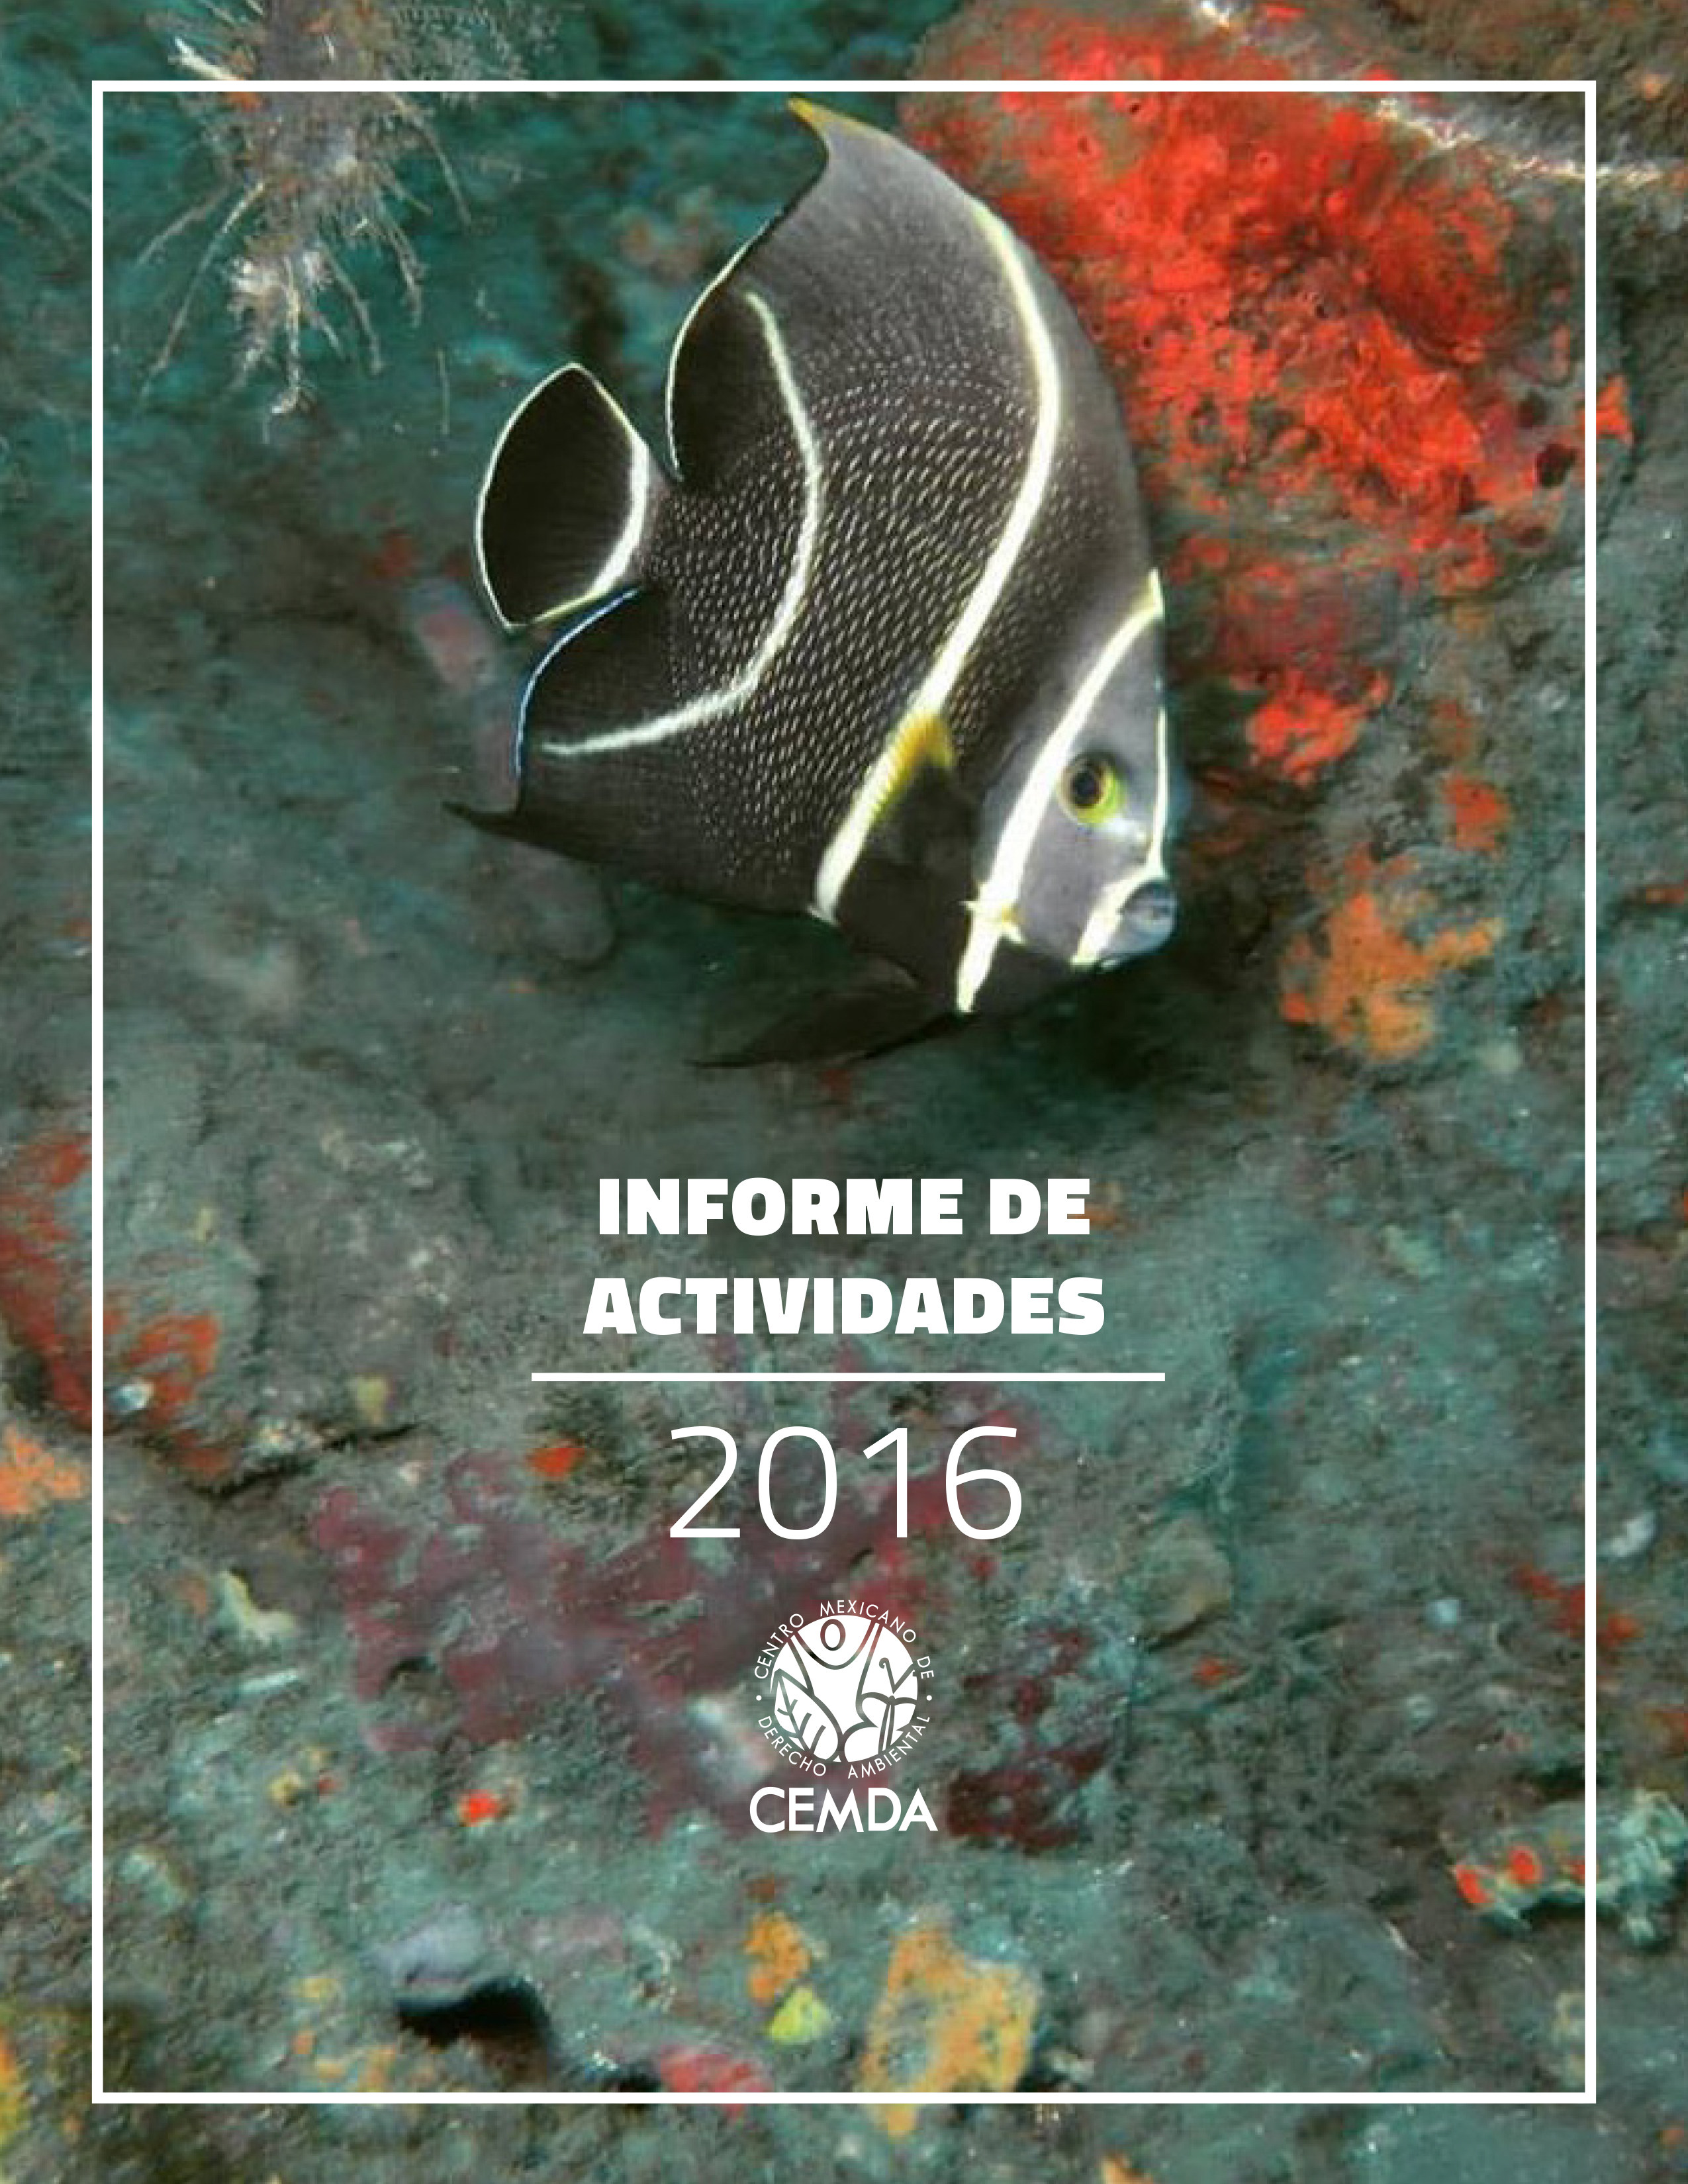 Reporte de Actividades 2016